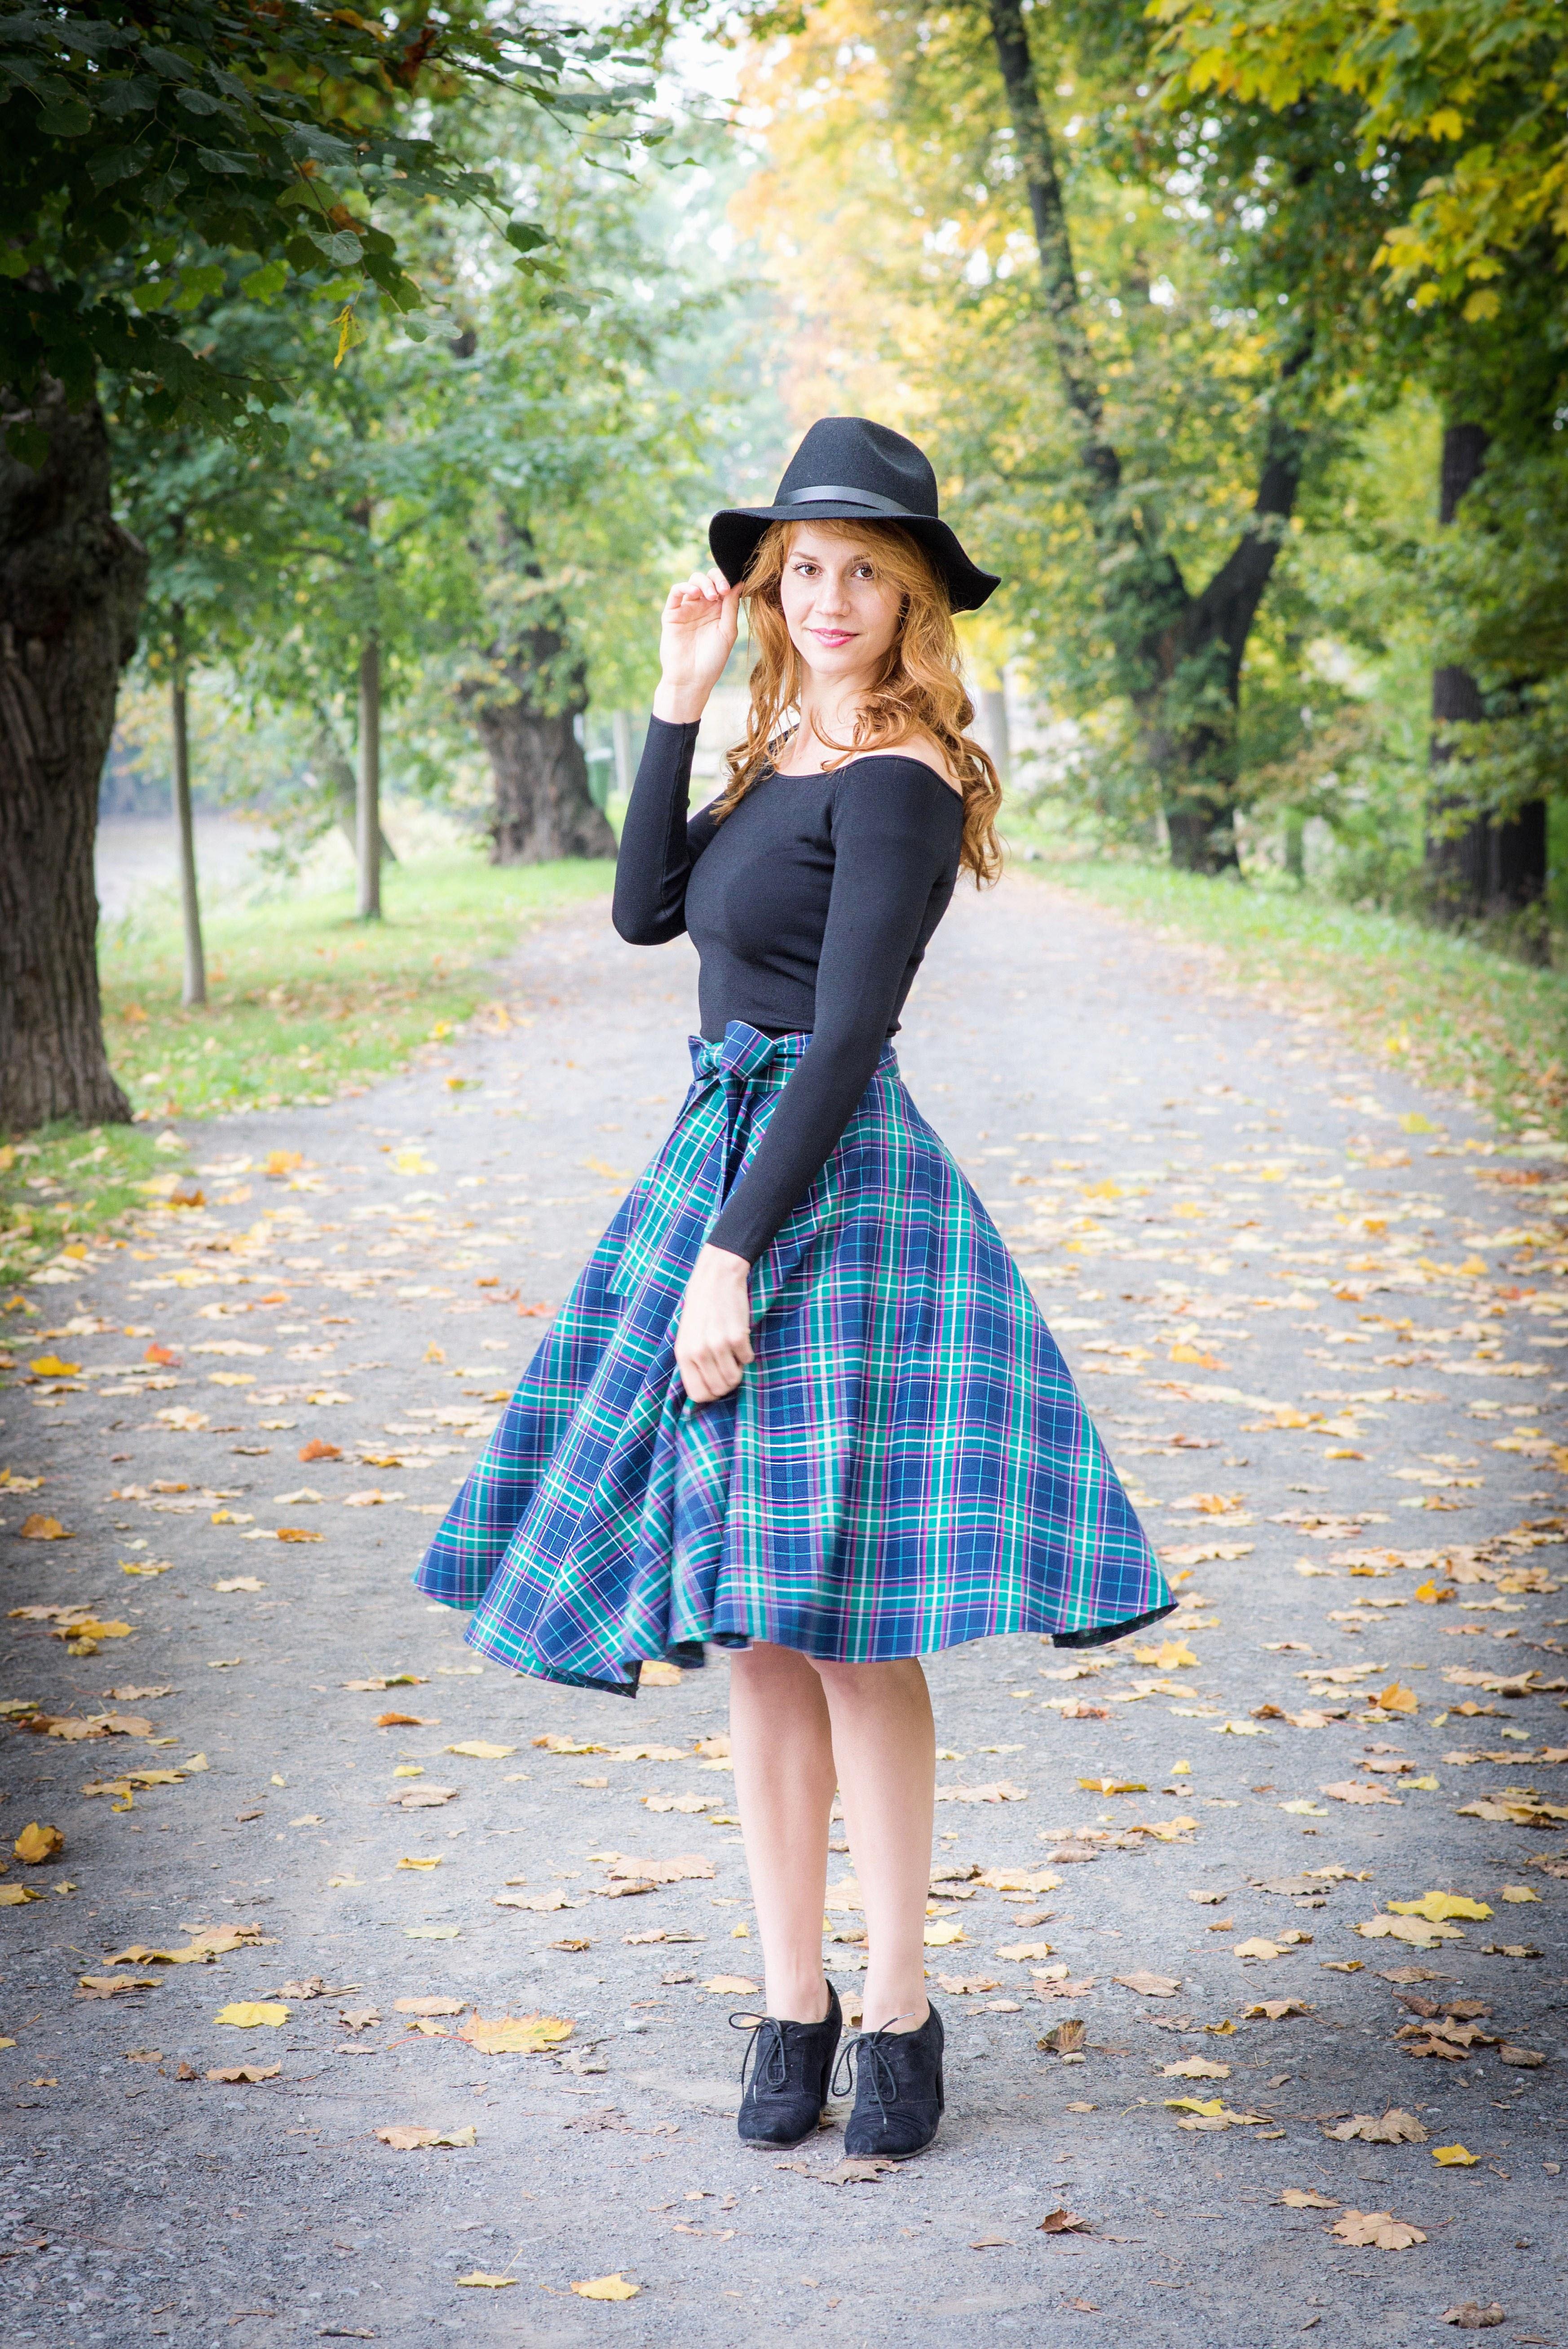 Retro šaty kdekoliv a kdykoliv - Mia Bella 4a9b828945